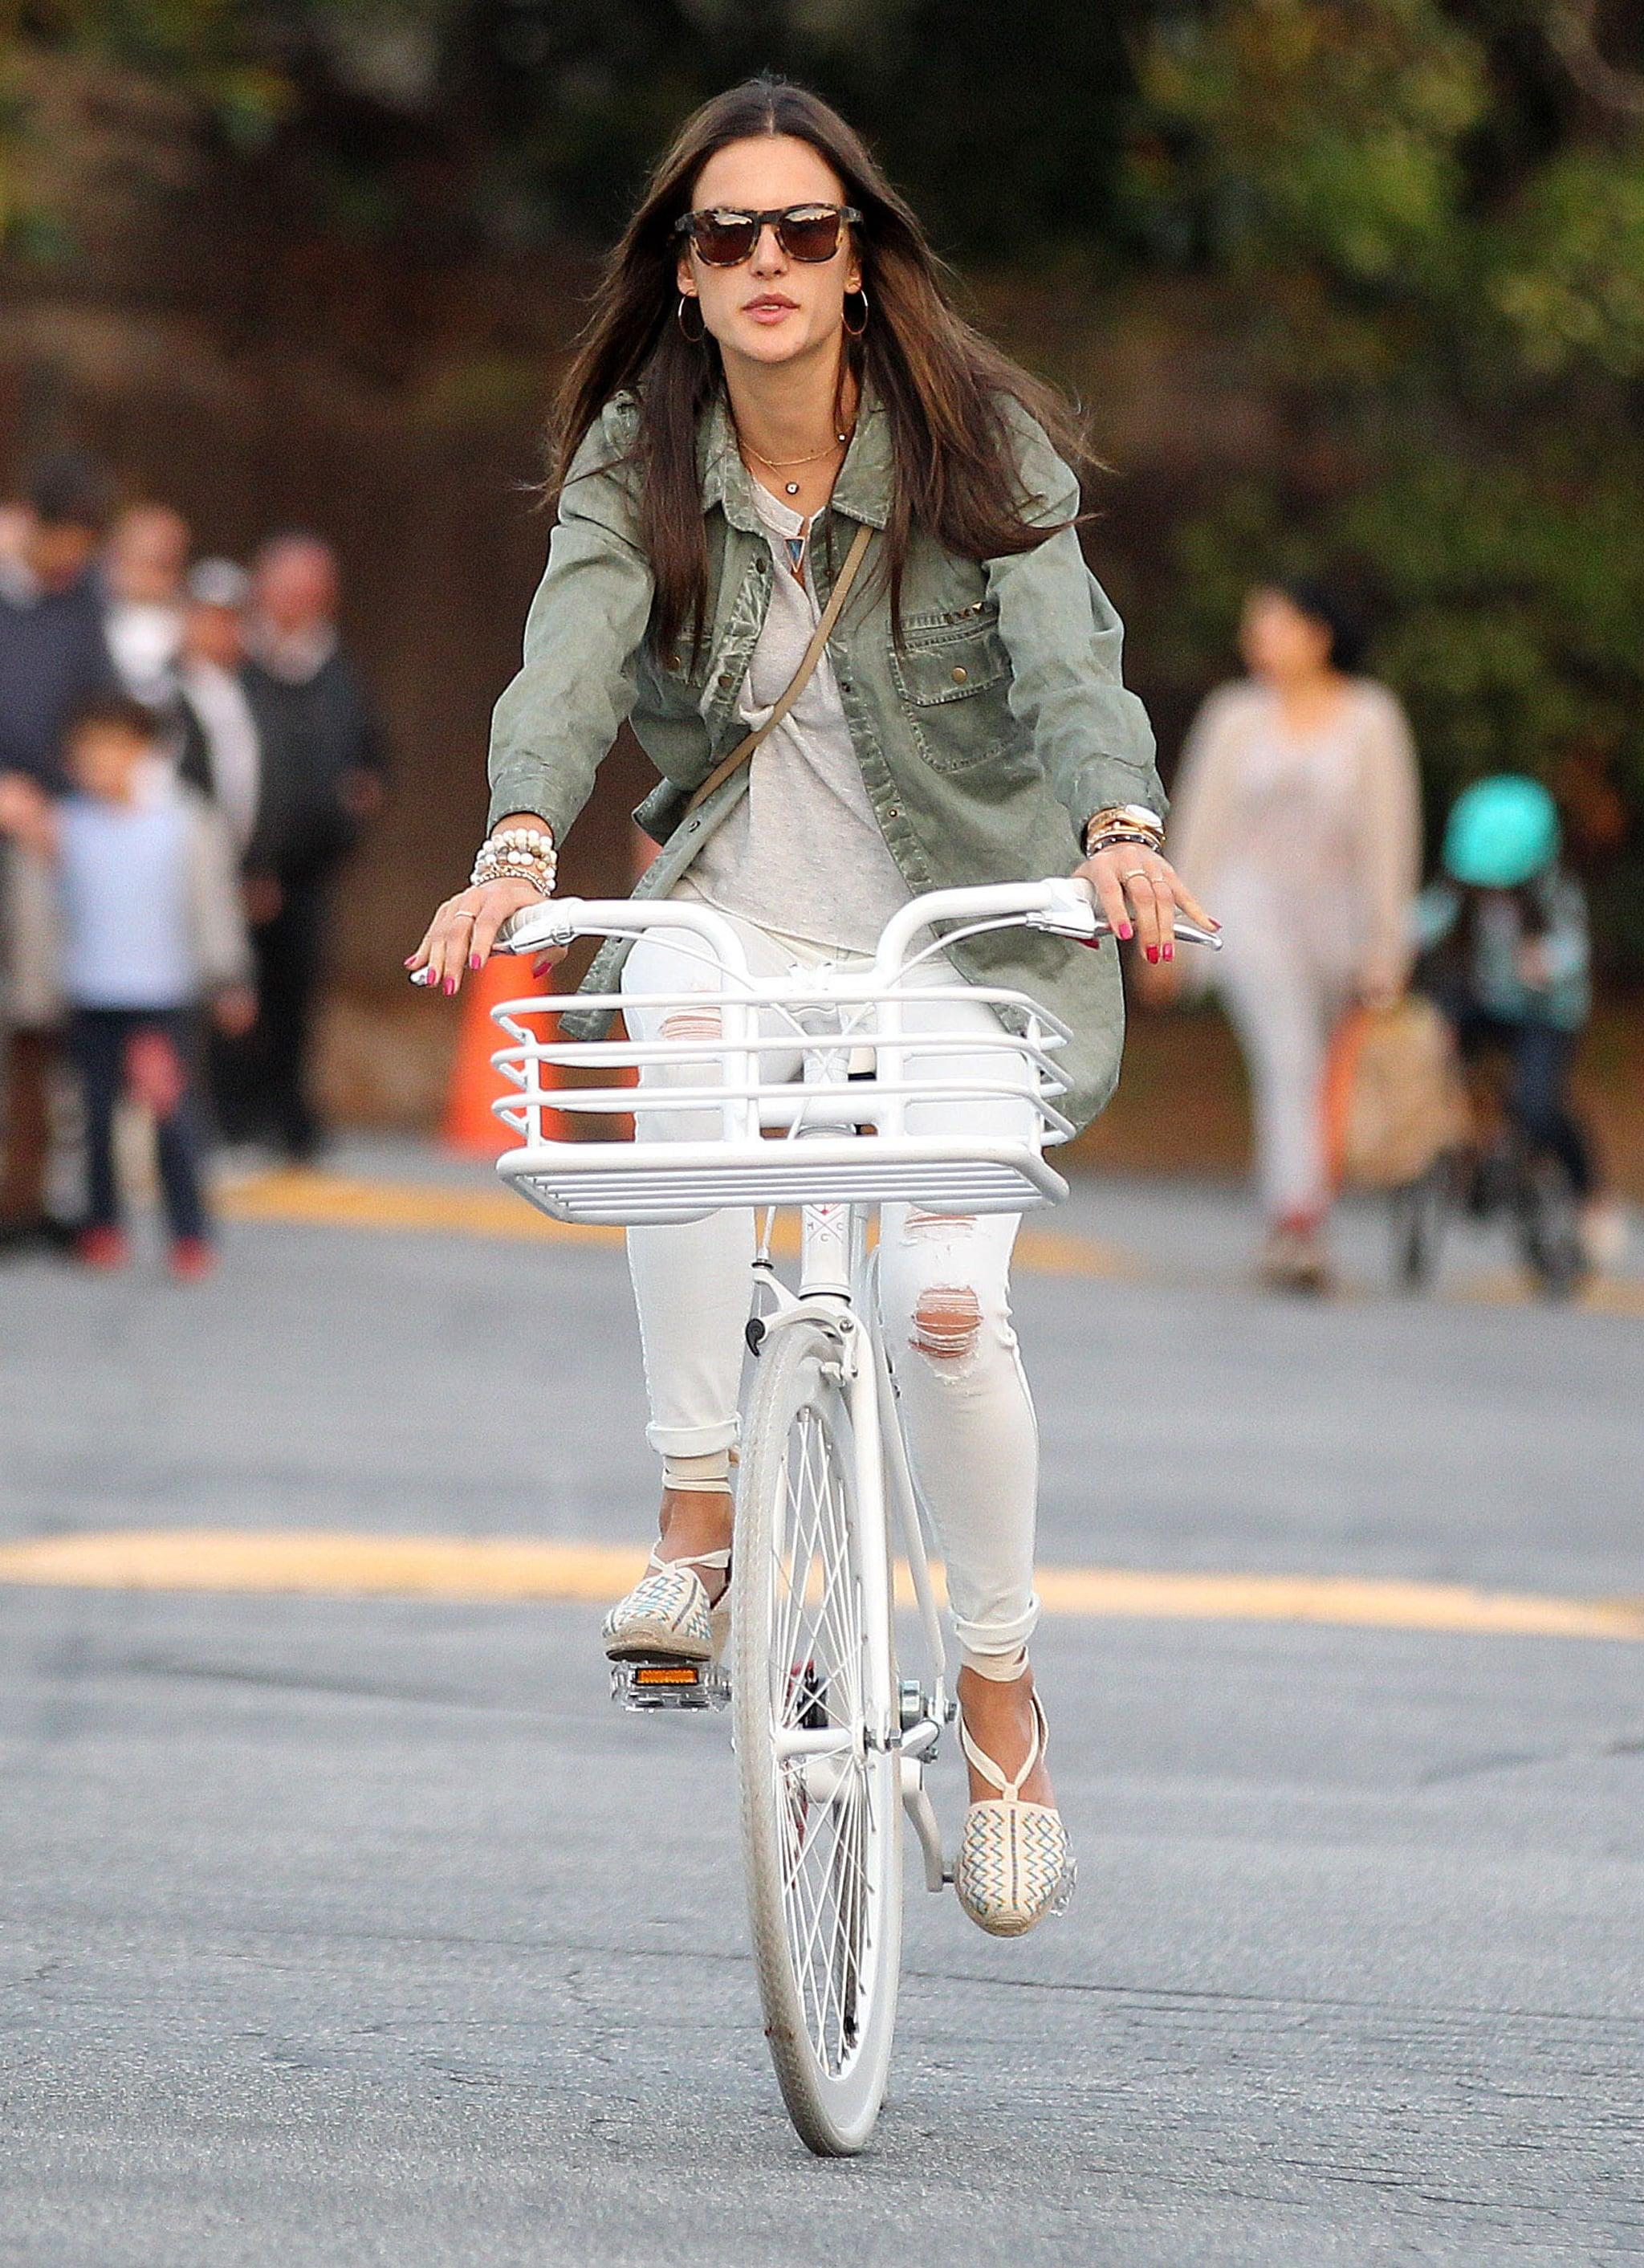 On Sunday, Alessandra Ambrosio went for a bike ride in LA.